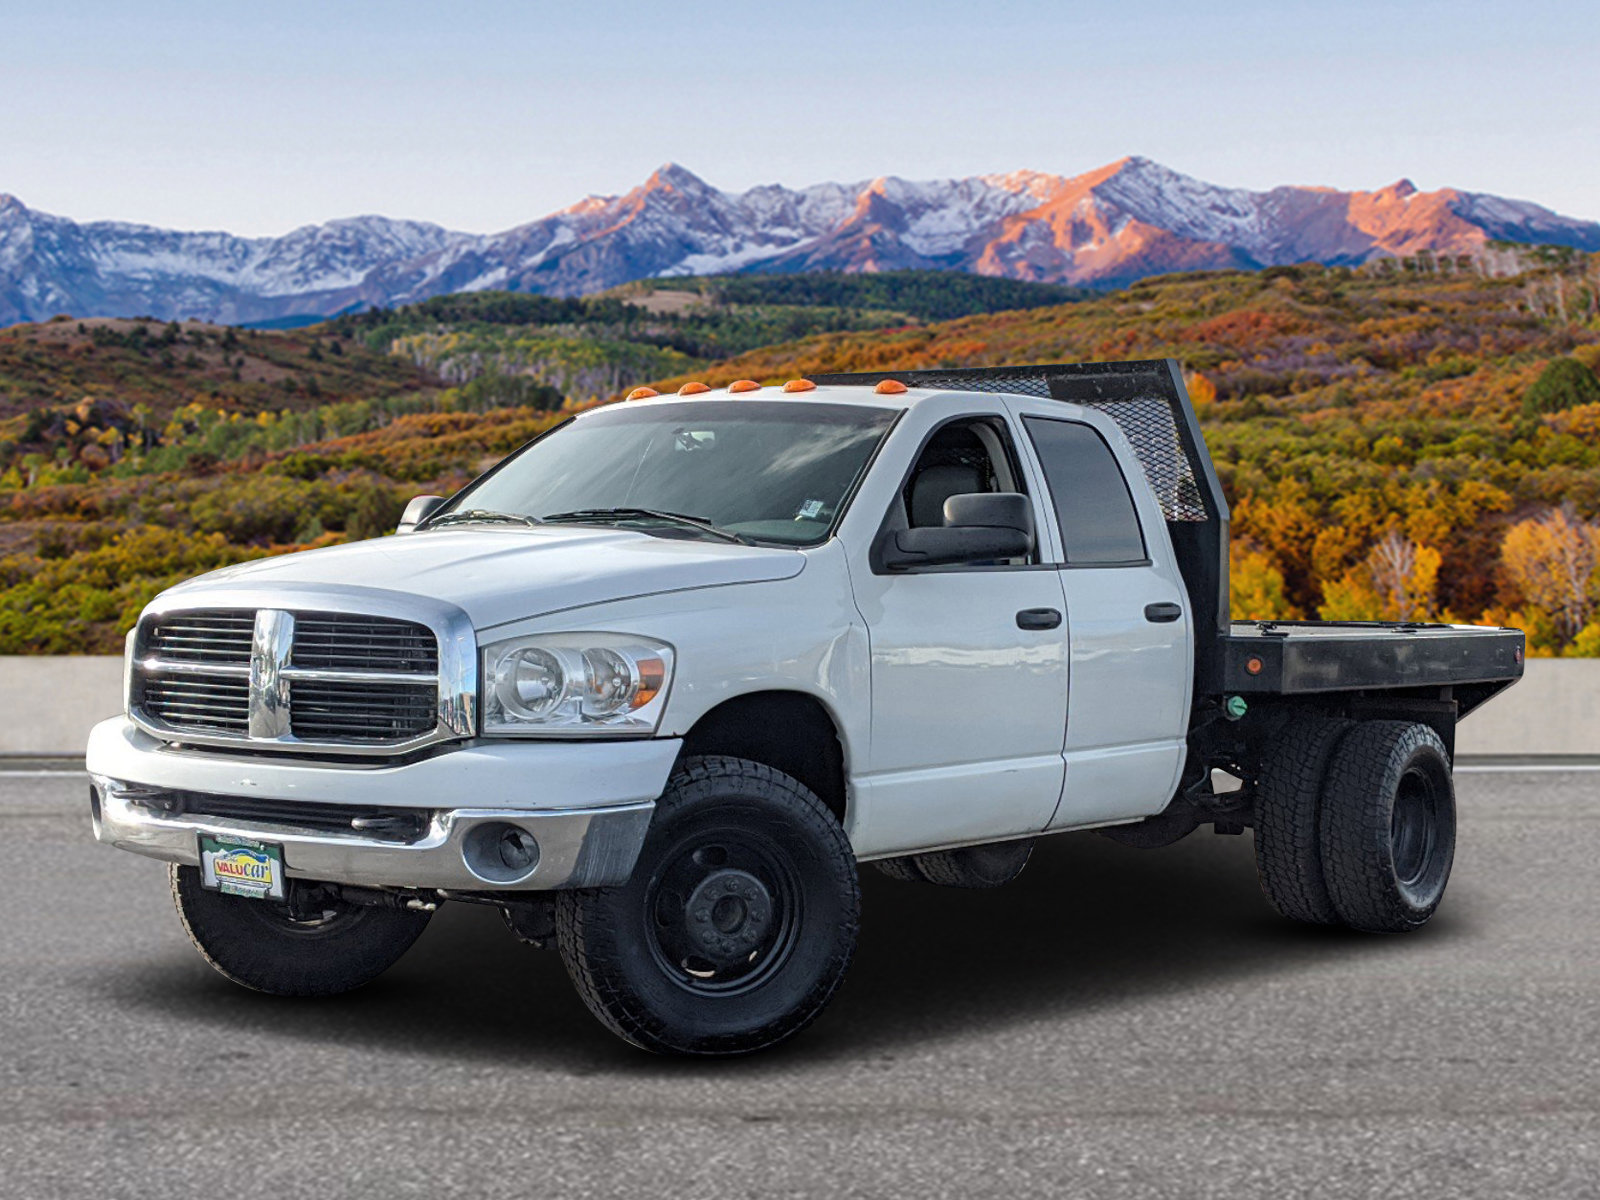 2008 Dodge Ram 3500 Truck SLT image